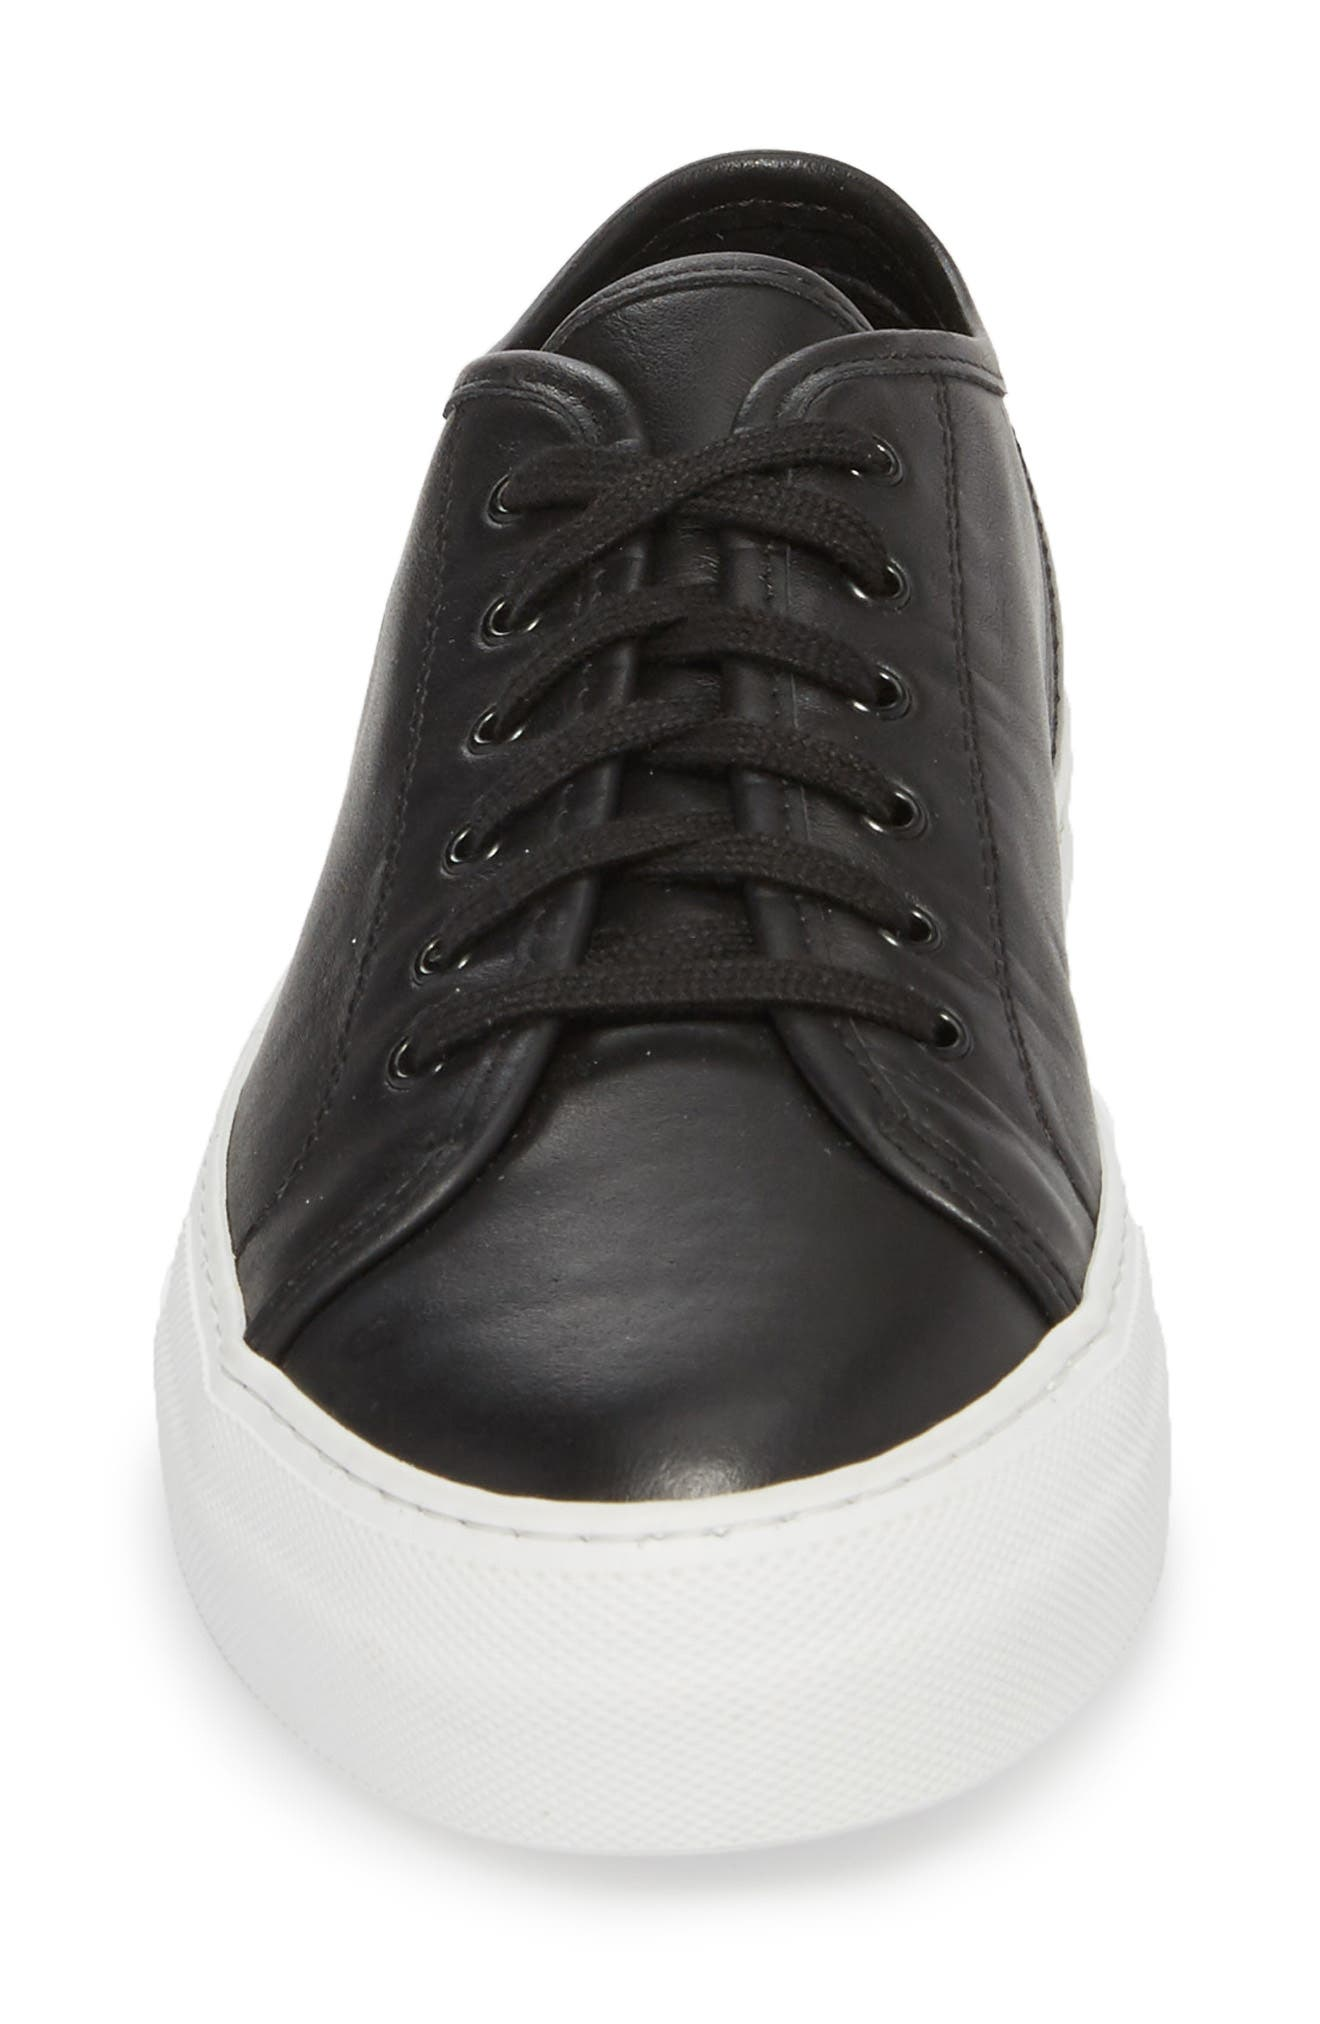 Tournament Low Top Sneaker,                             Alternate thumbnail 4, color,                             Black